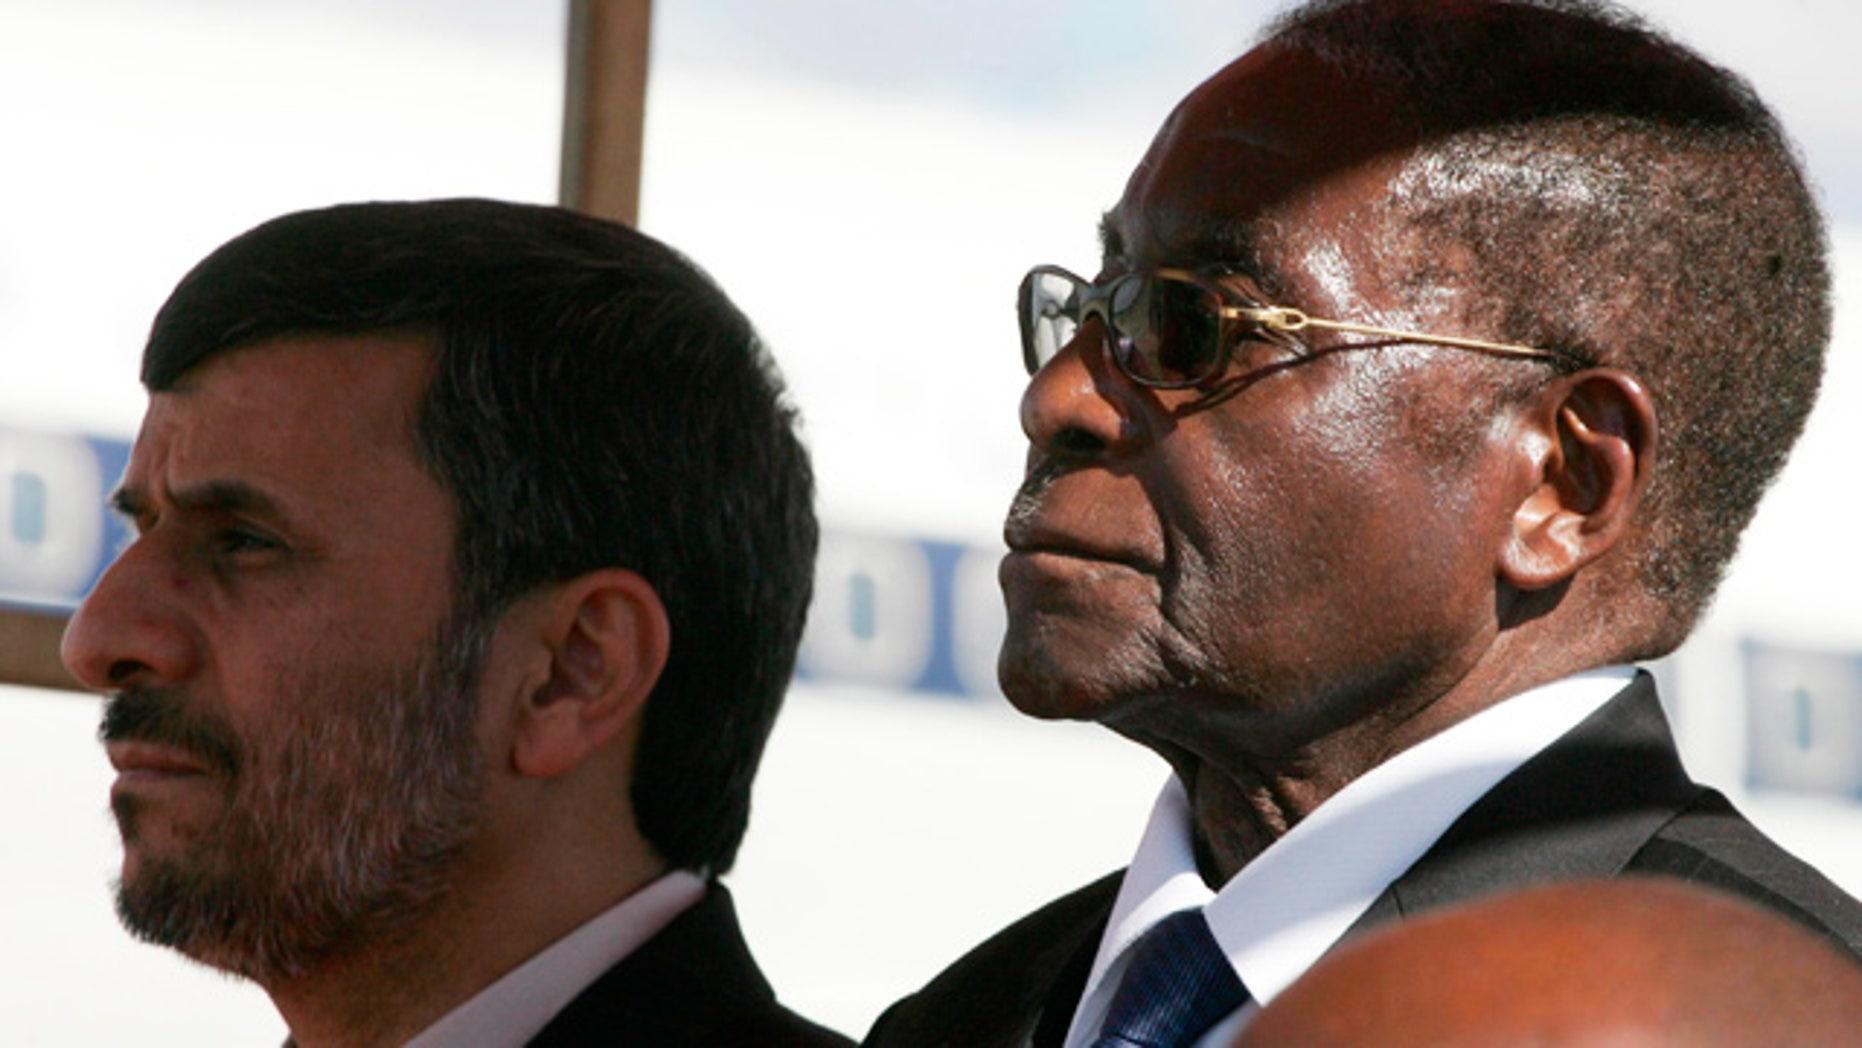 April 22: Robert Mugabe and Mahmoud Ahmadinejad pictured together at Harare Airport.